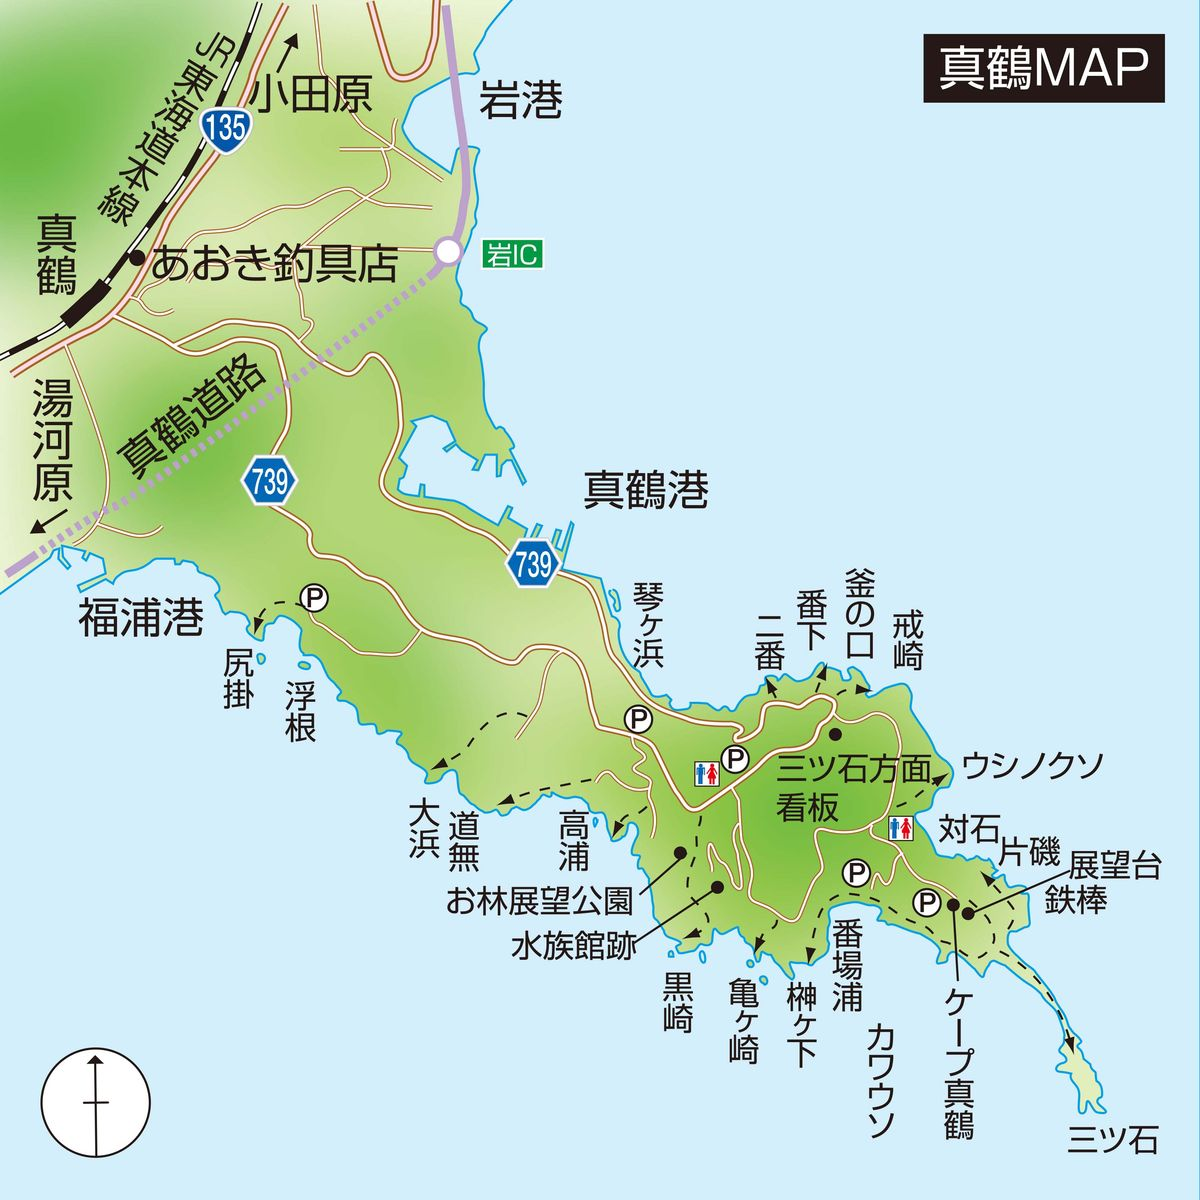 078-101_zenkokutsuribaGW06_cs6 (9)